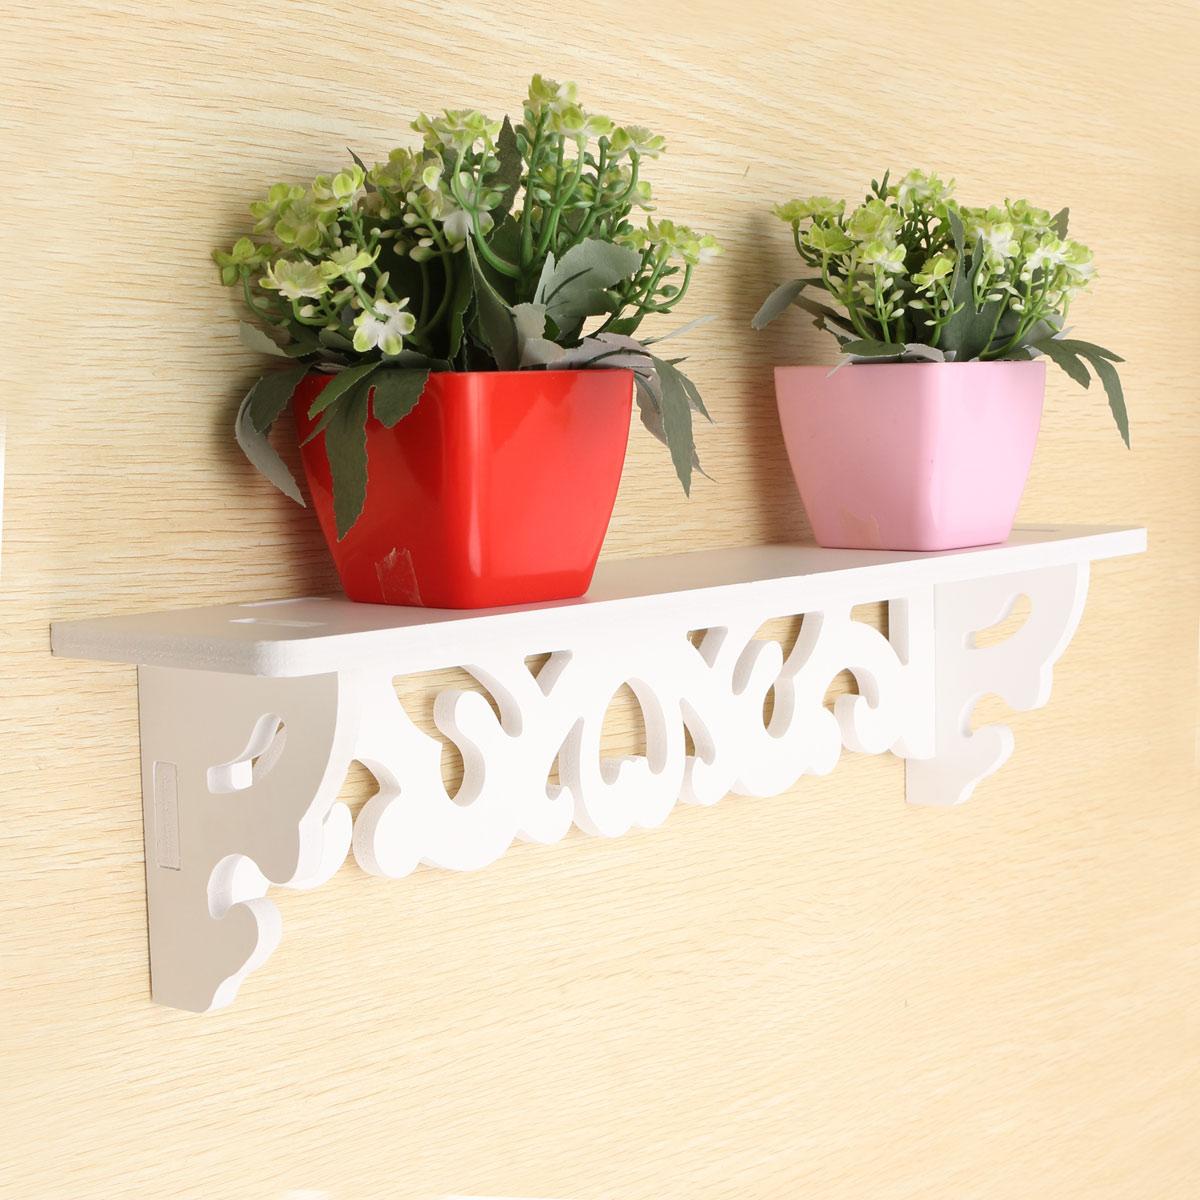 White-Wooden-Wall-Mounted-Shelf-Display-Hanging-Rack-Storage-Holder-Home-Decor